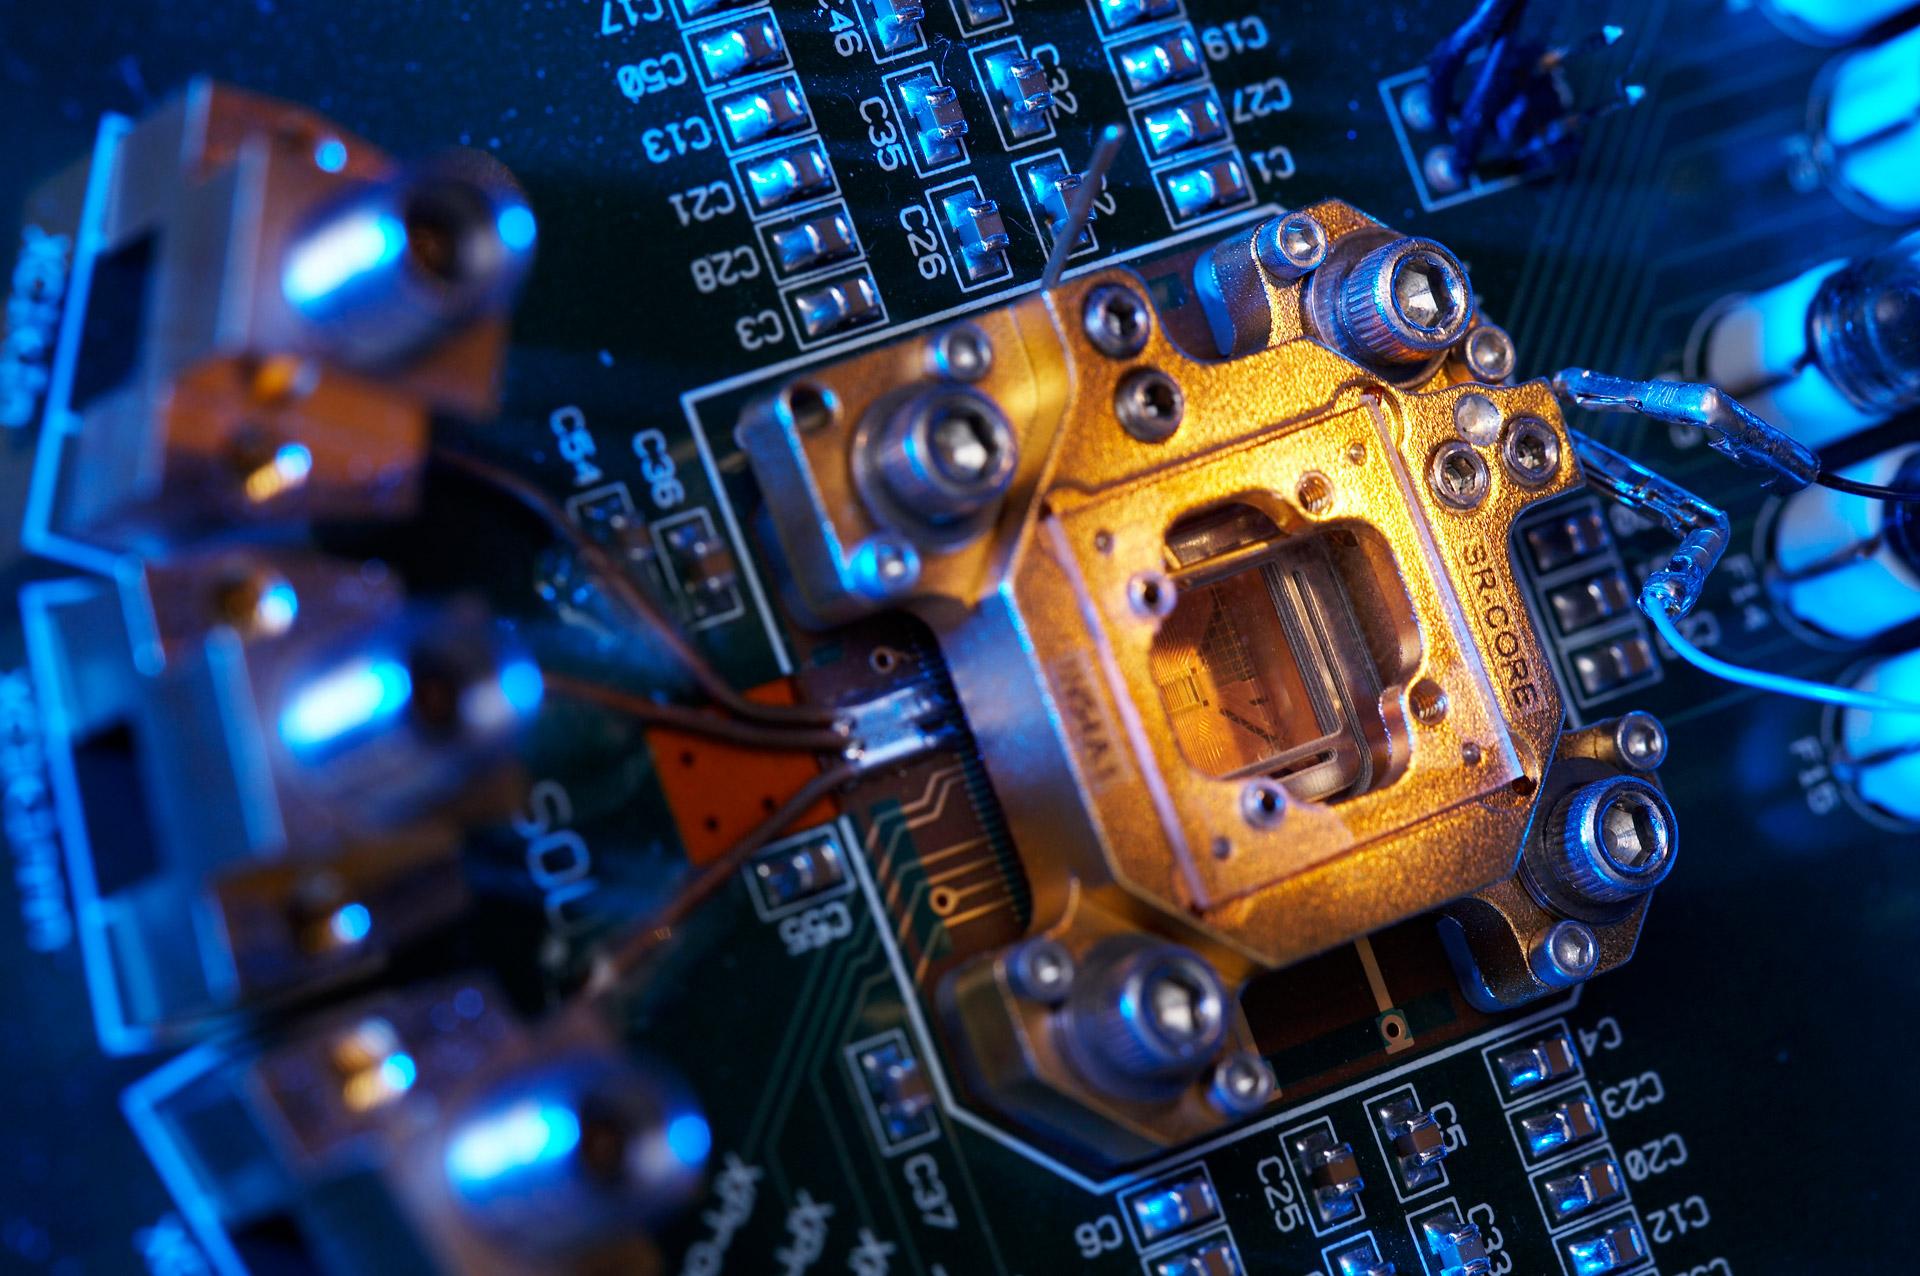 geek electronics resistors transistors HD Wallpaper   General 626121 1920x1276